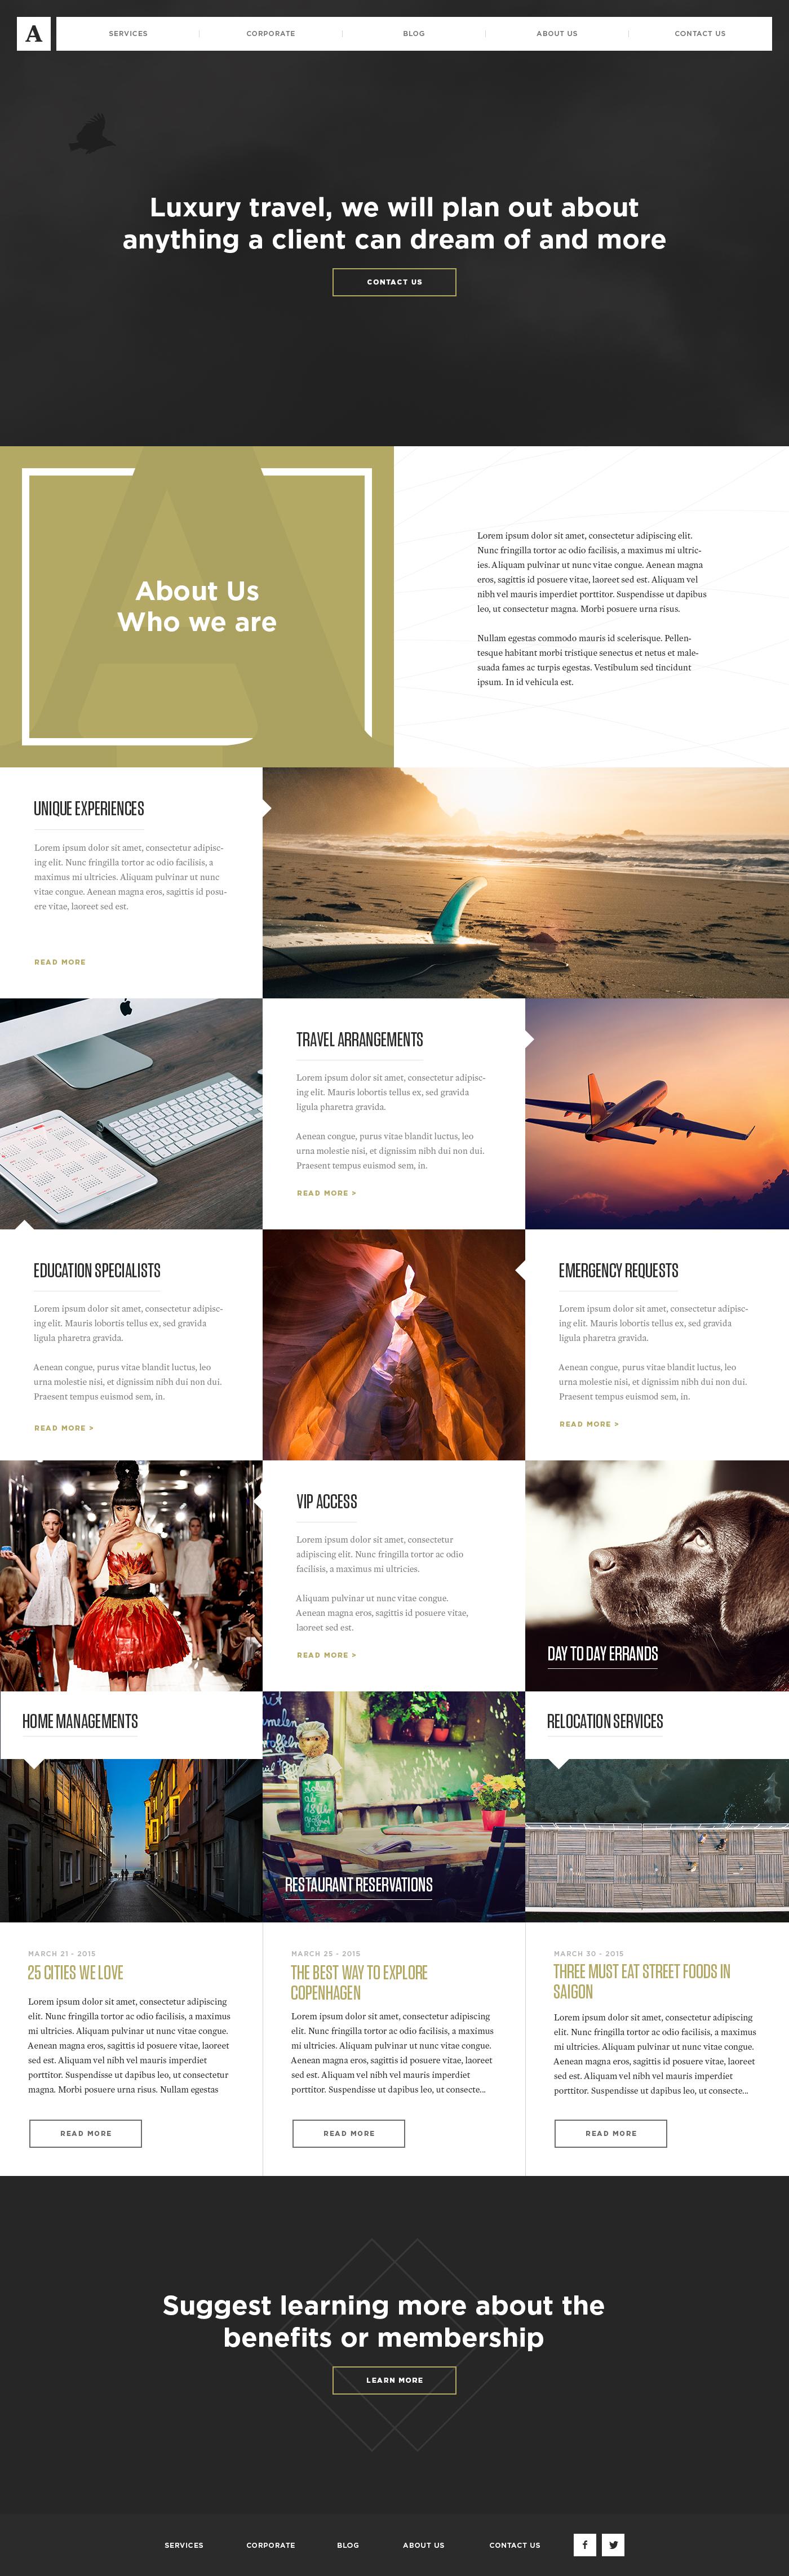 Luxury travel agency2